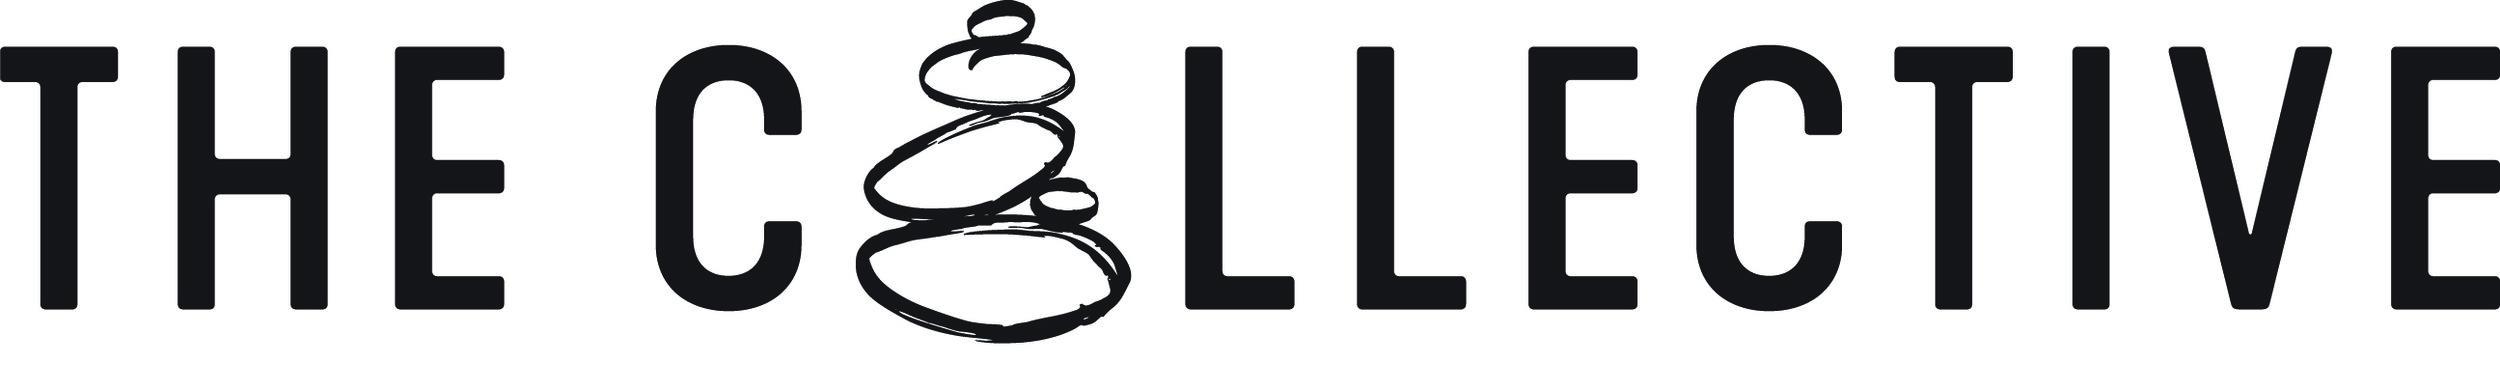 TheCollective_logo.jpg